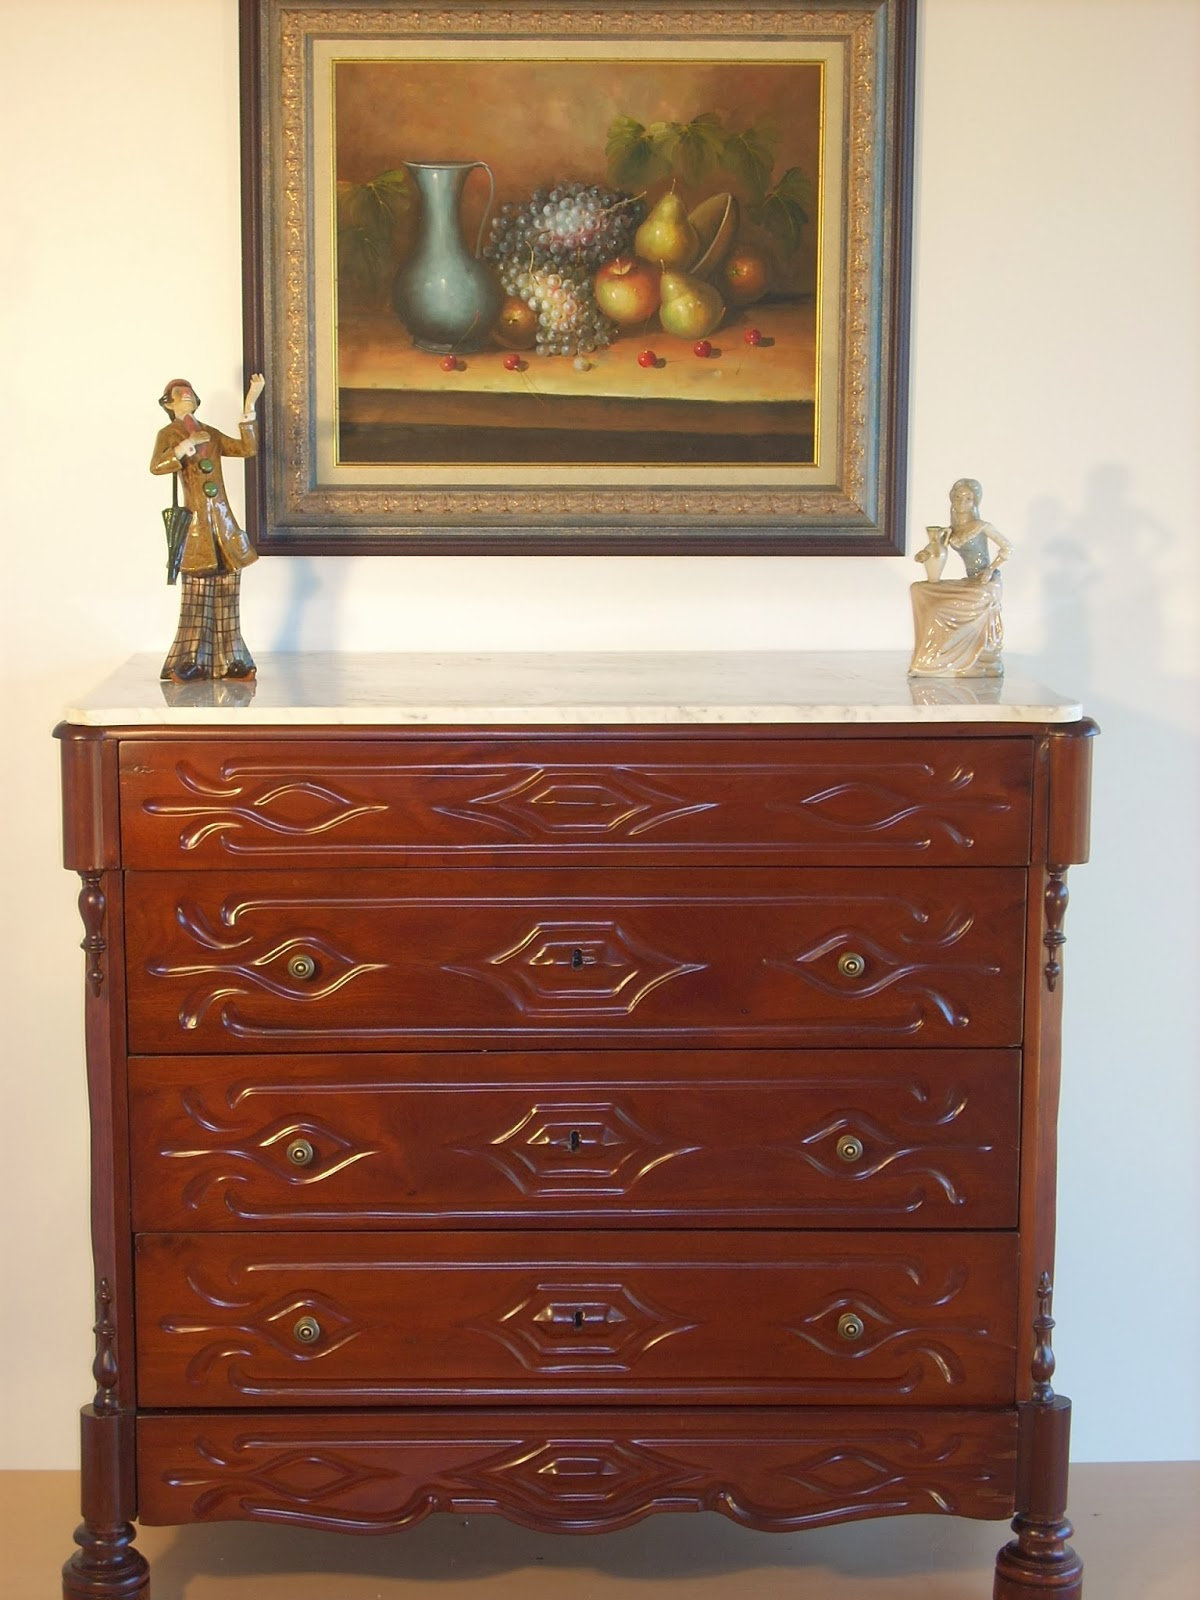 Venta de muebles antiguos restaurados naturmoble c moda - Muebles de caoba antiguos ...